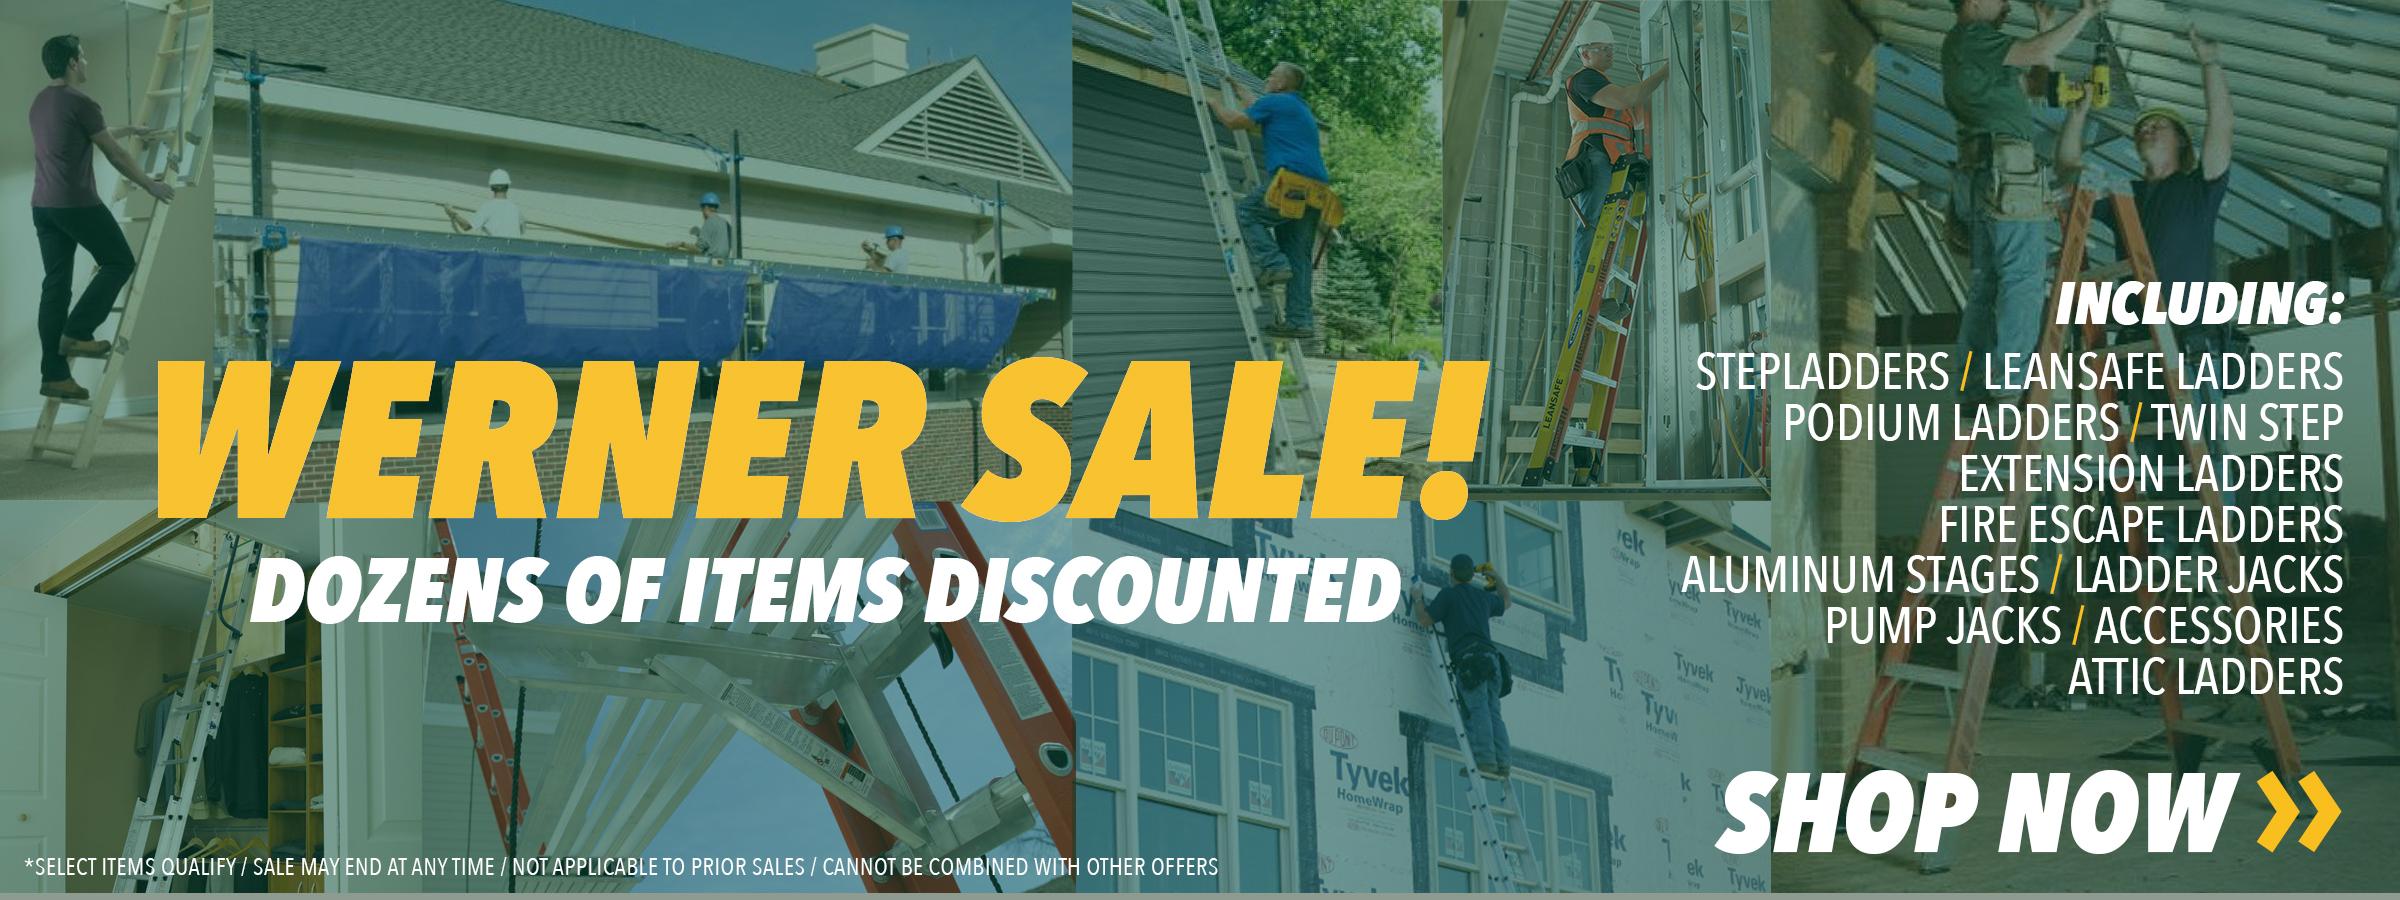 Save on Werner Equipment!